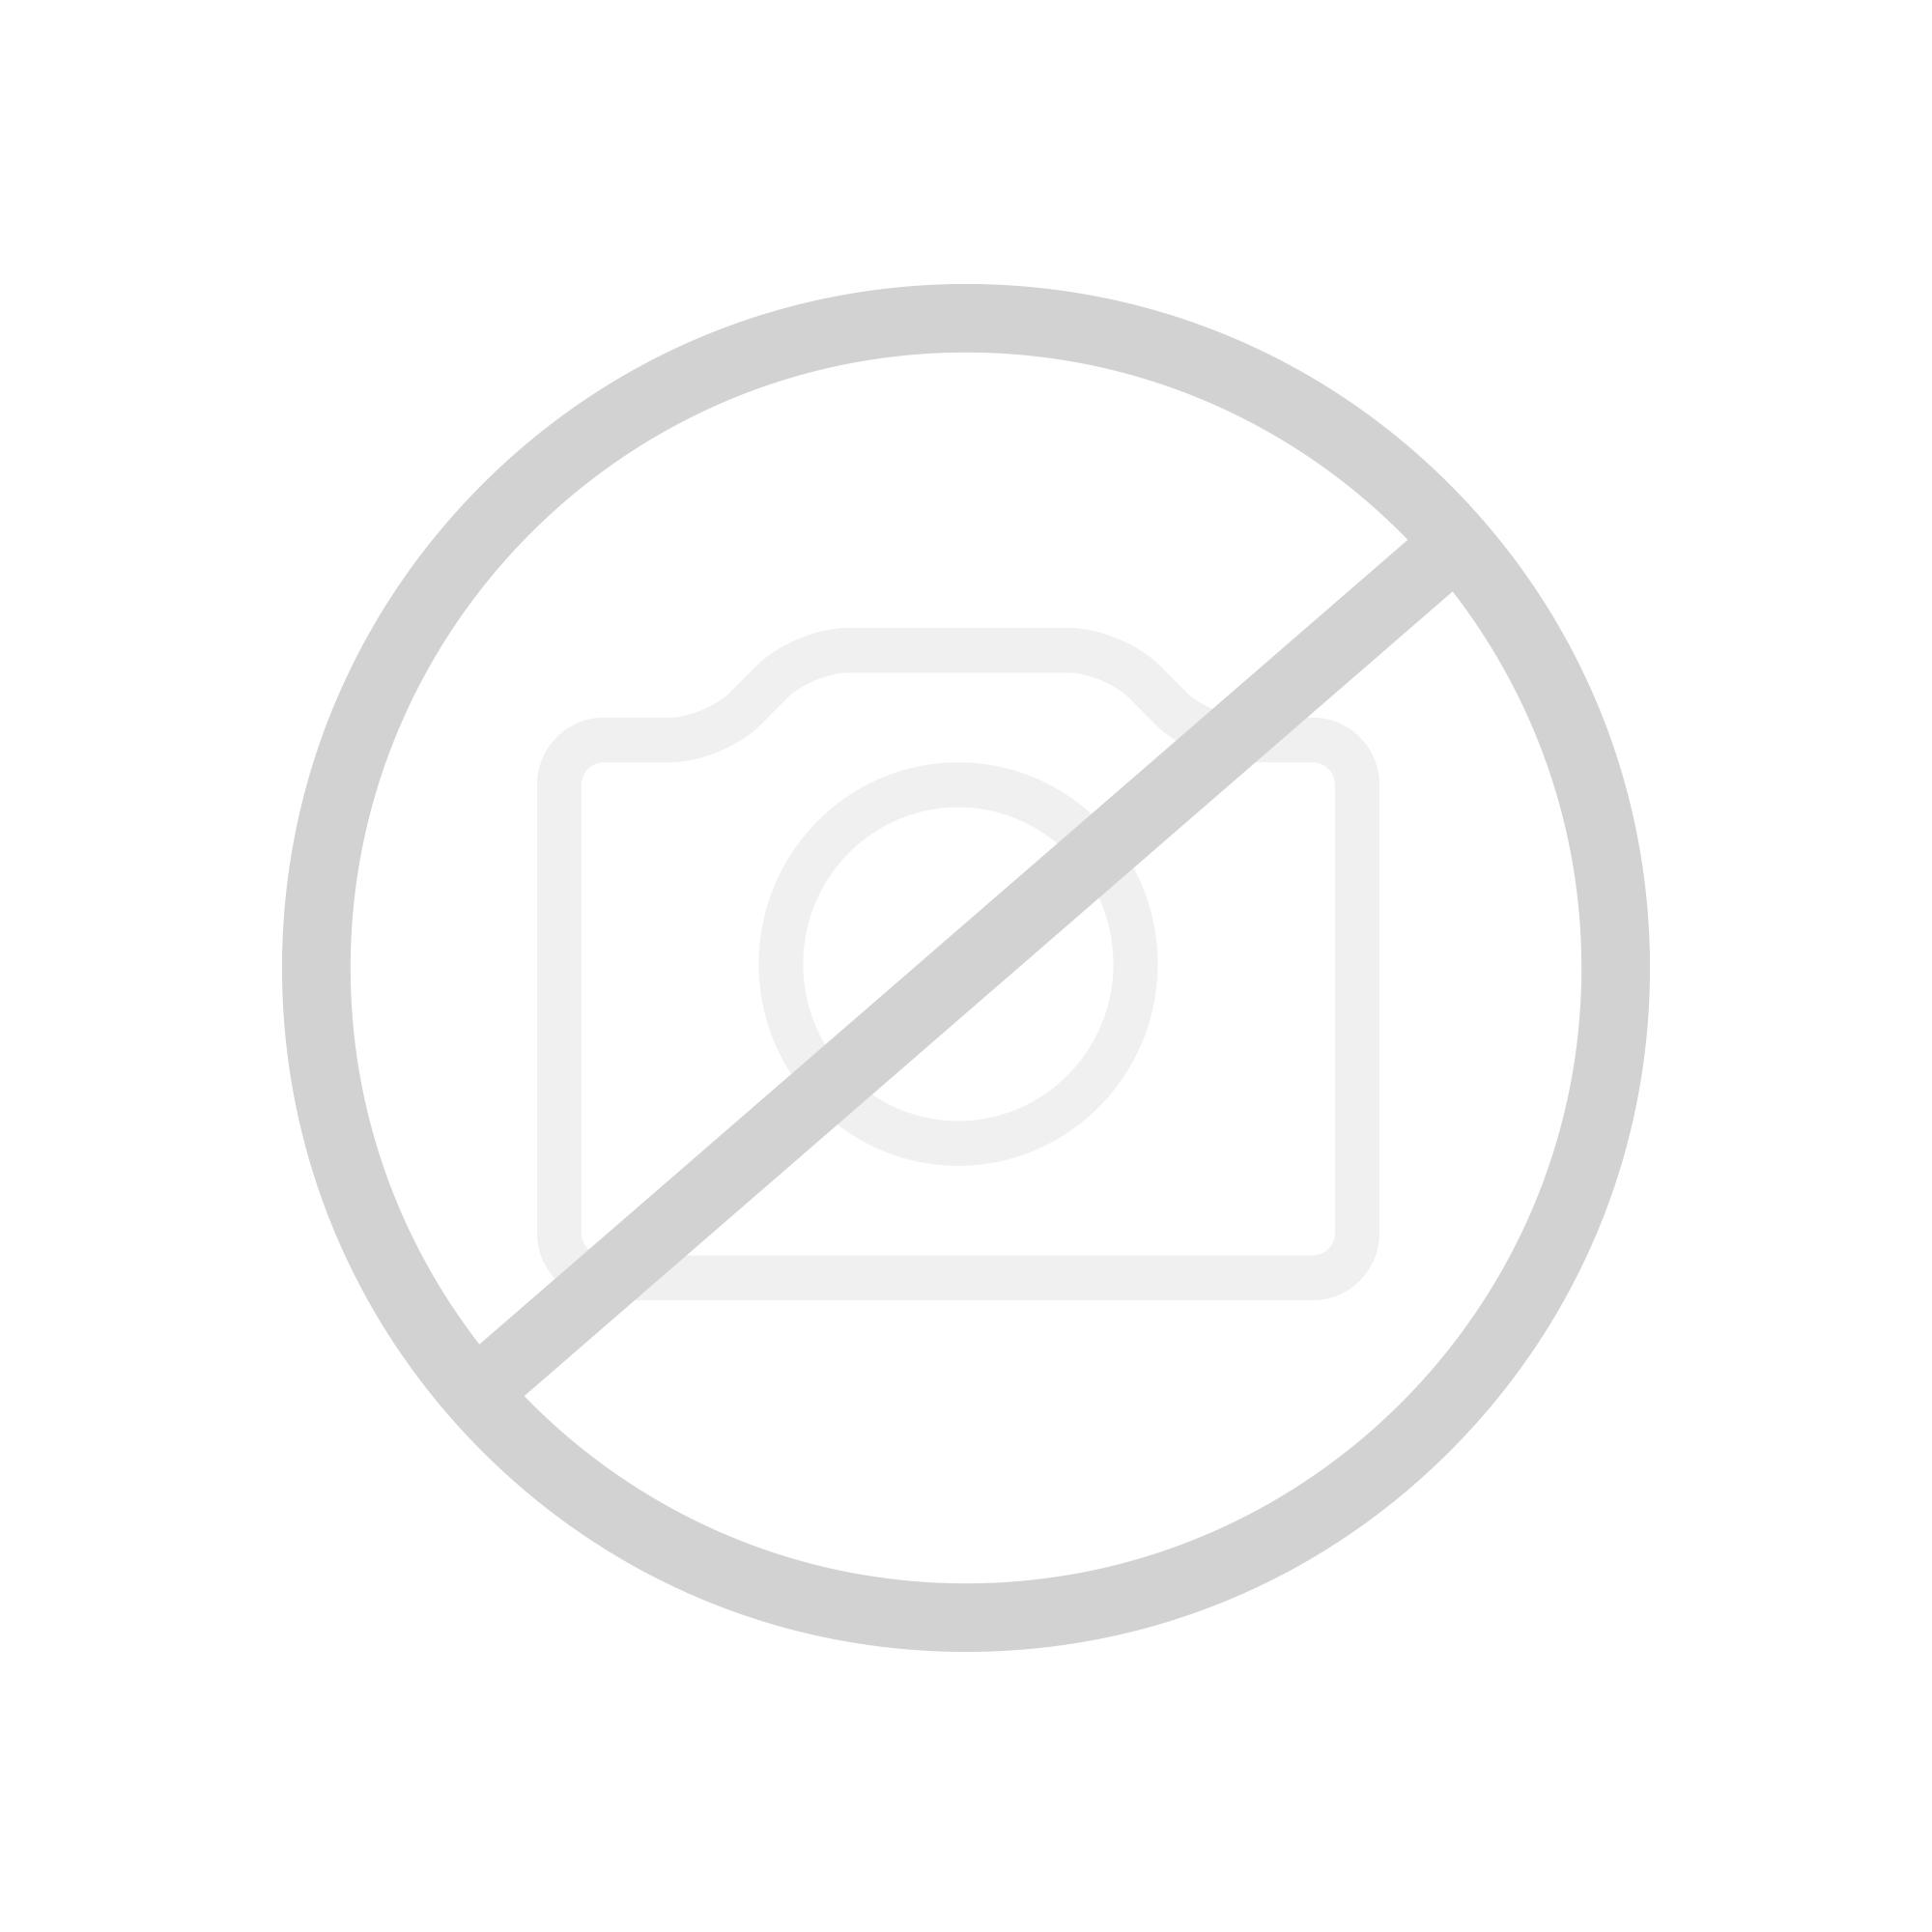 kludi objekta thermostat brausearmatur 352000538 reuter onlineshop. Black Bedroom Furniture Sets. Home Design Ideas